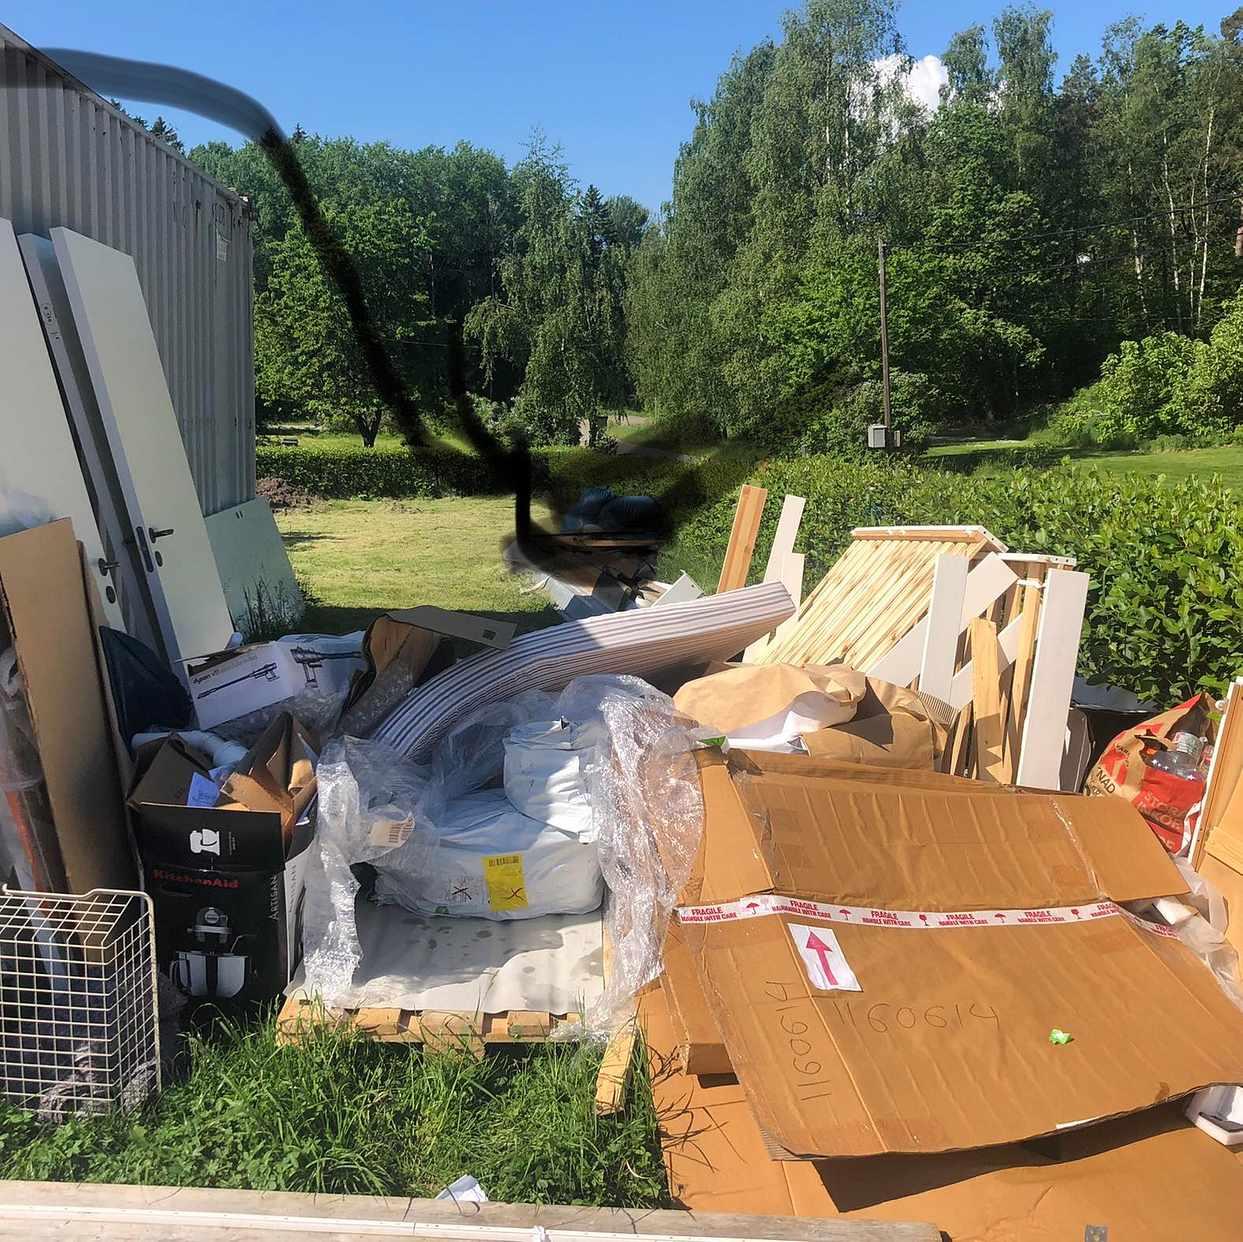 image of Emballage, trasig möbel m - Värmdö